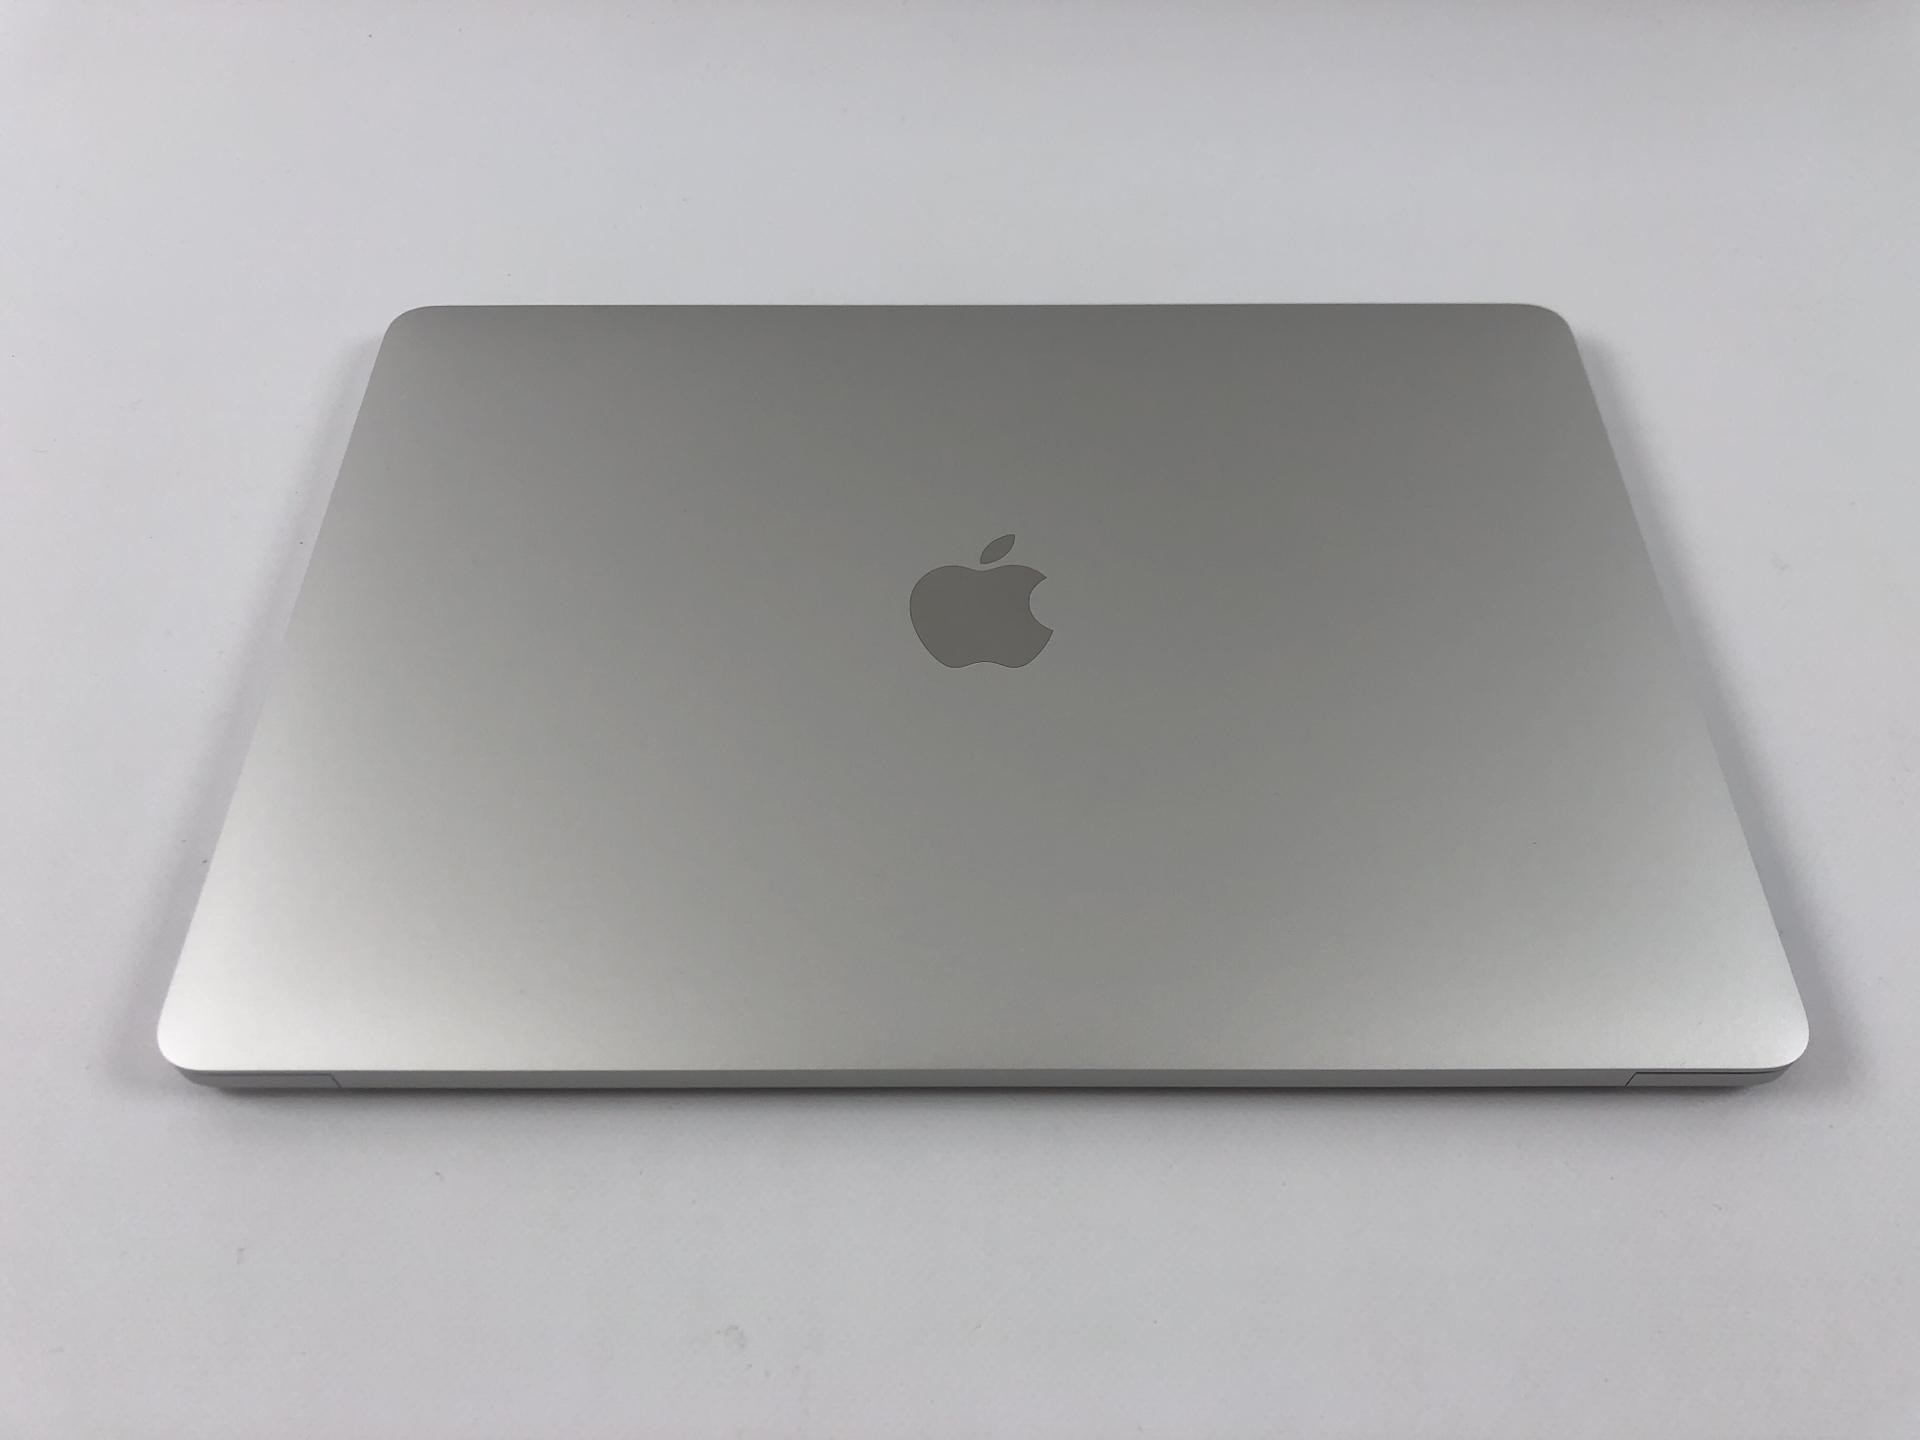 "MacBook Pro 13"" 4TBT Late 2016 (Intel Core i5 2.9 GHz 16 GB RAM 256 GB SSD), Silver, Intel Core i5 2.9 GHz, 16 GB RAM, 256 GB SSD, Bild 2"